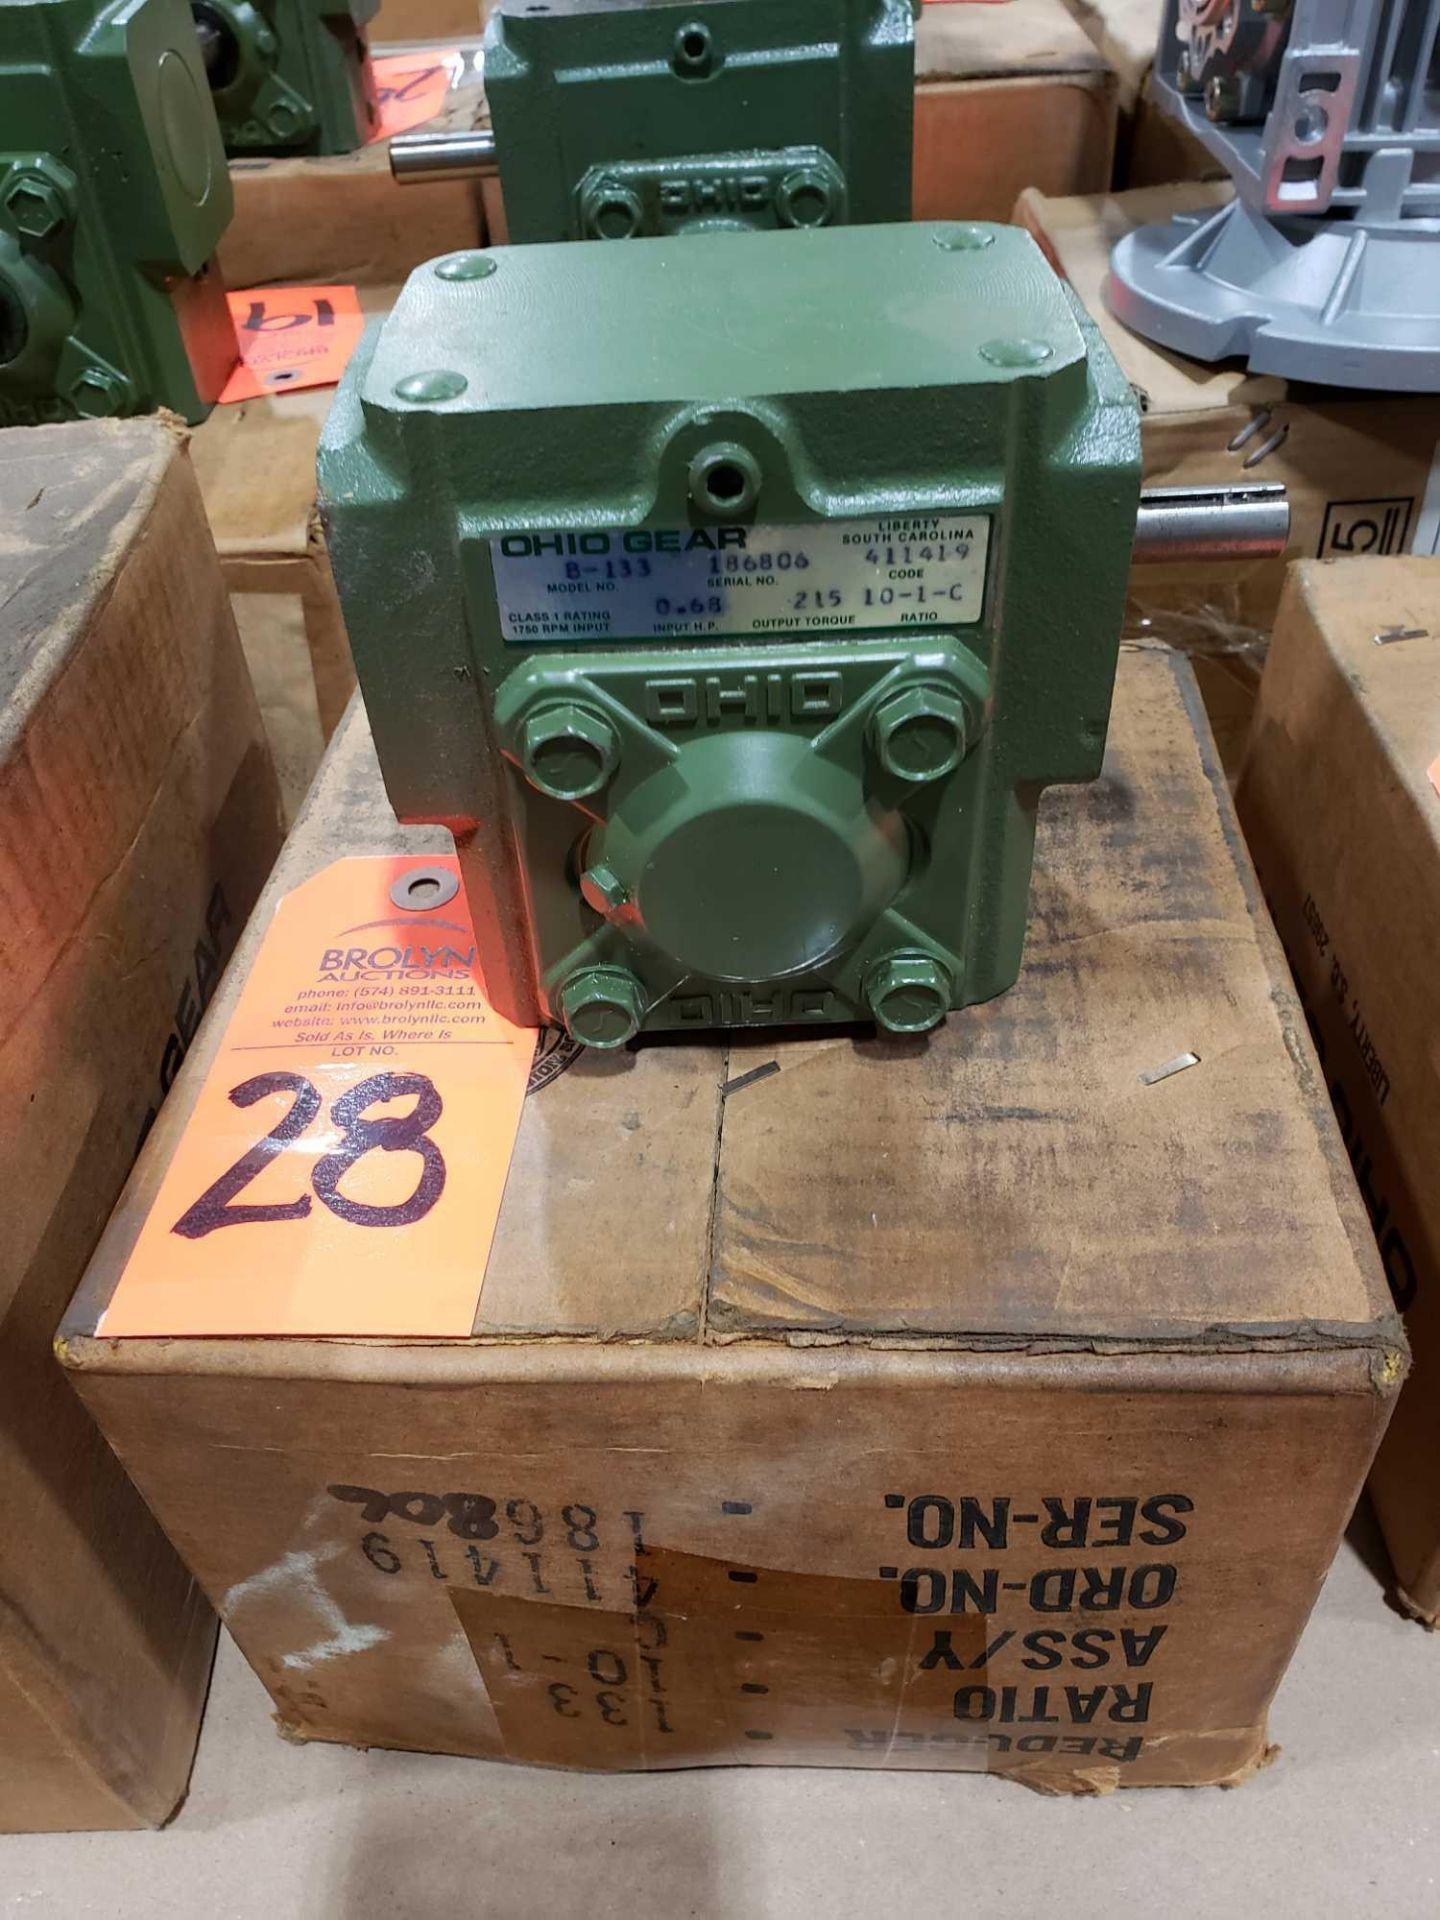 Lot 28 - Ohio Gear model B-133 gearbox. 10-1 C ratio. New in box.